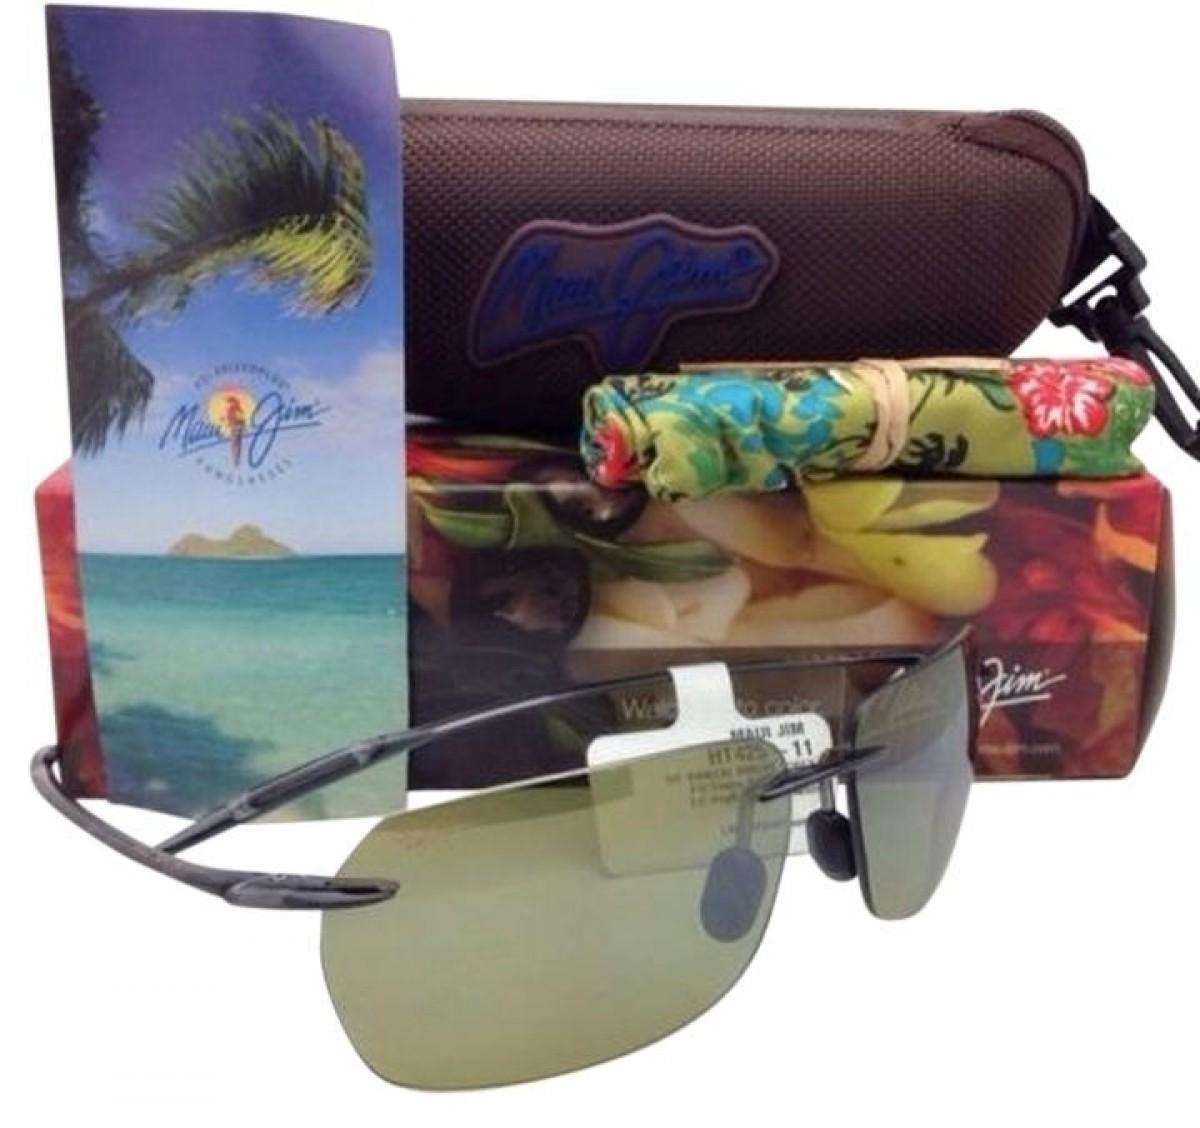 Maui Jim Banzai HT407-11, 125,00€, Occhiali Maui Jim Verde a forma Rettangolare